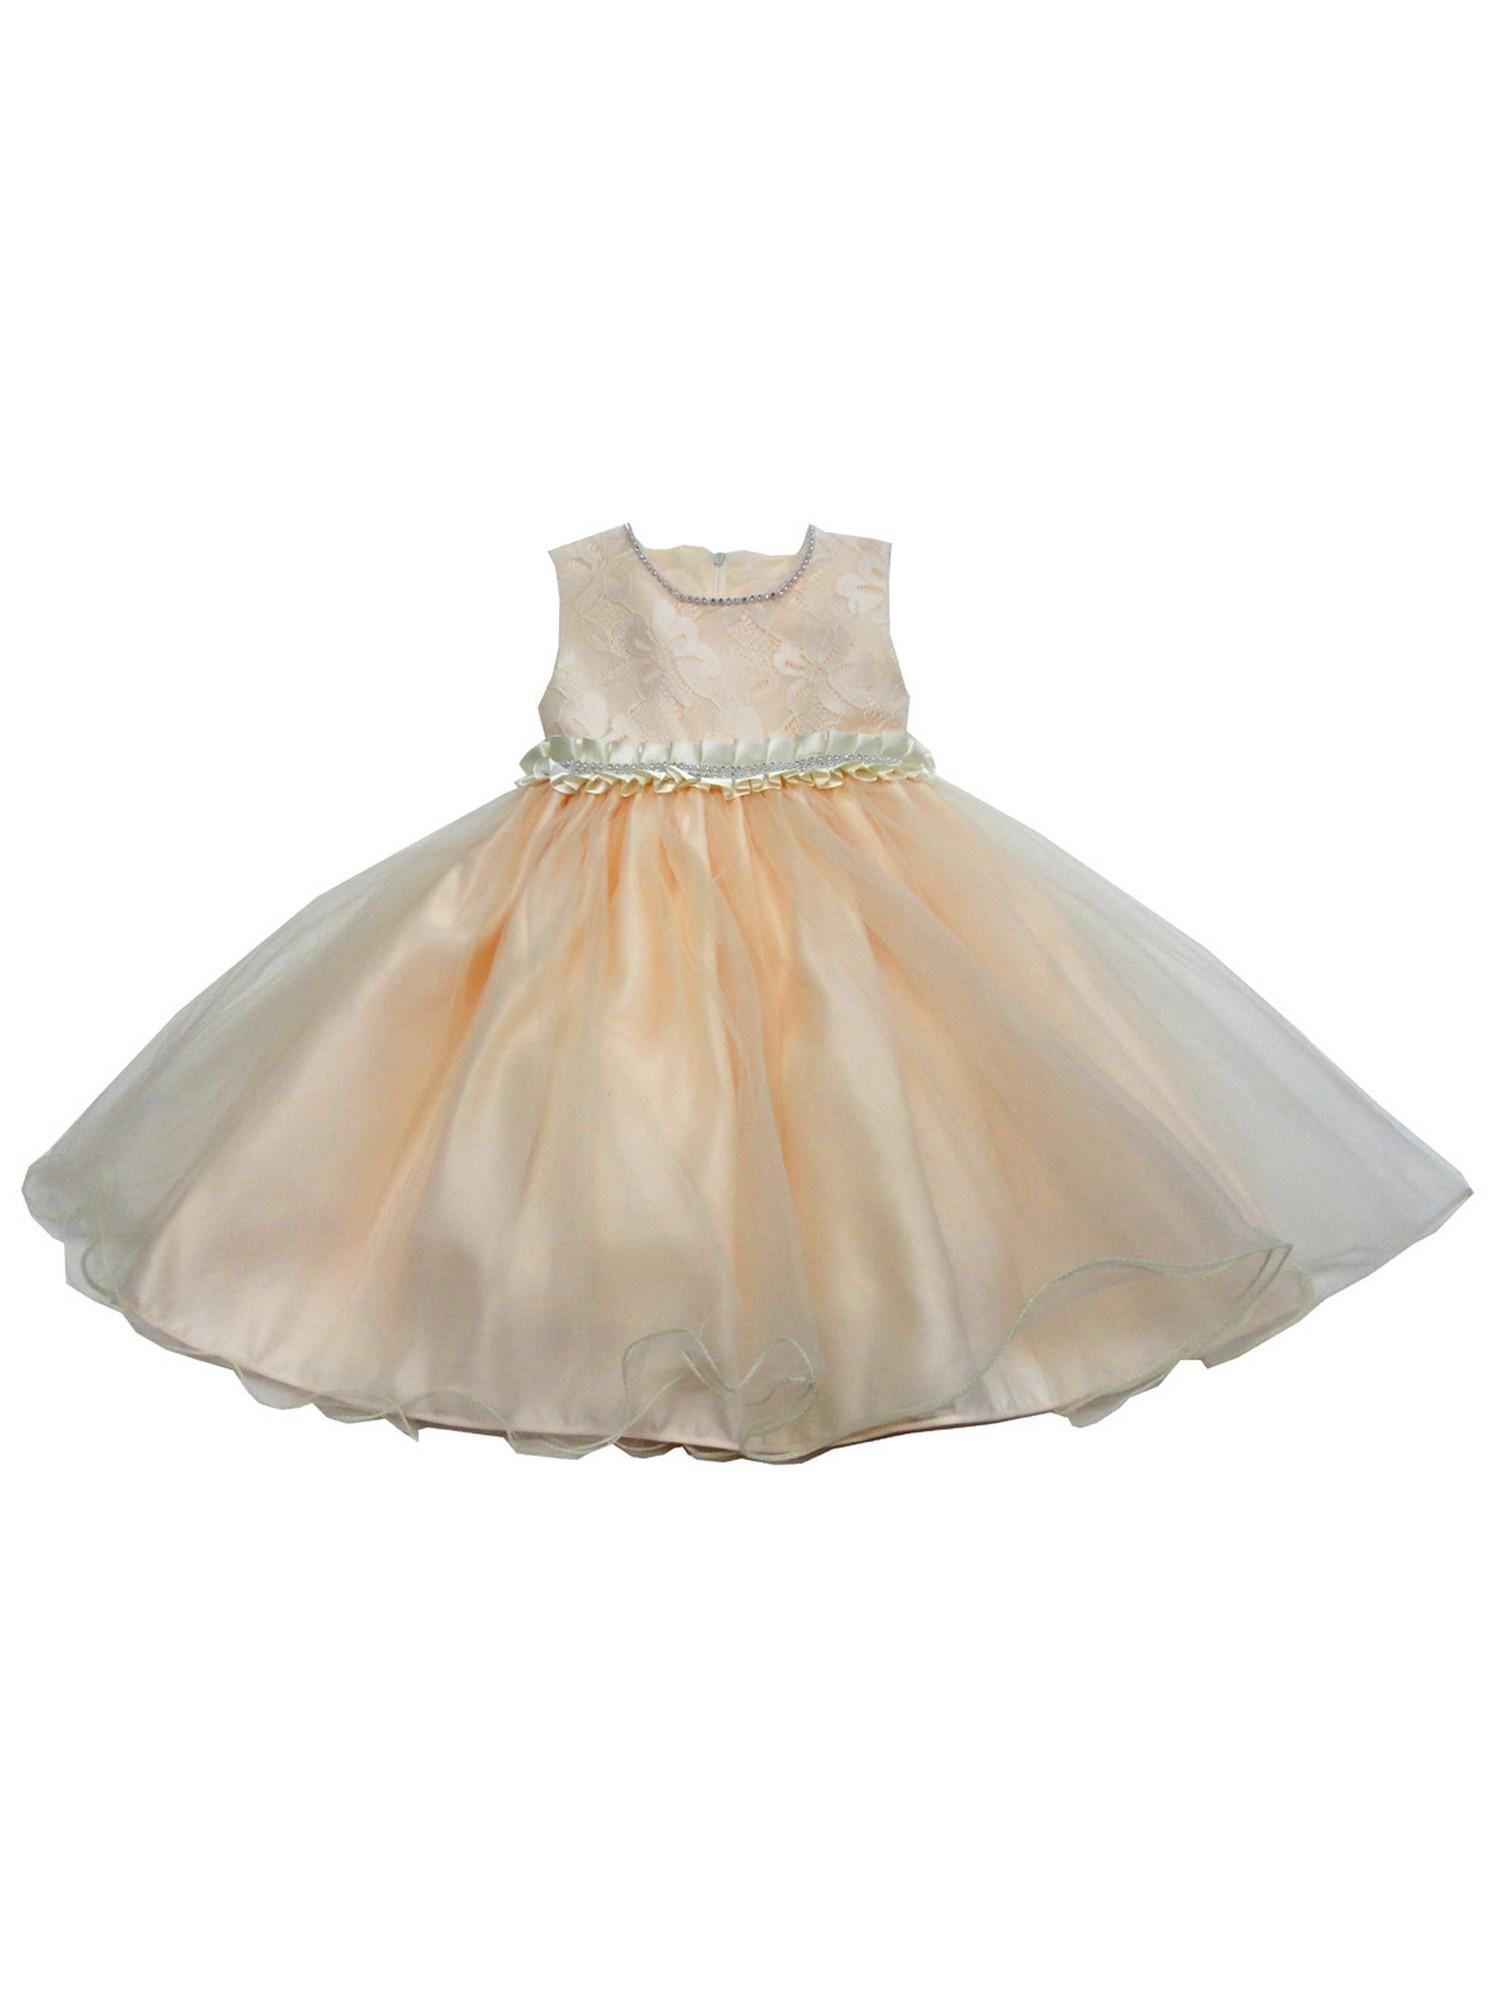 Baby Girls Champagne Glitter Trim Embroidered Organza Flower Girl Dress